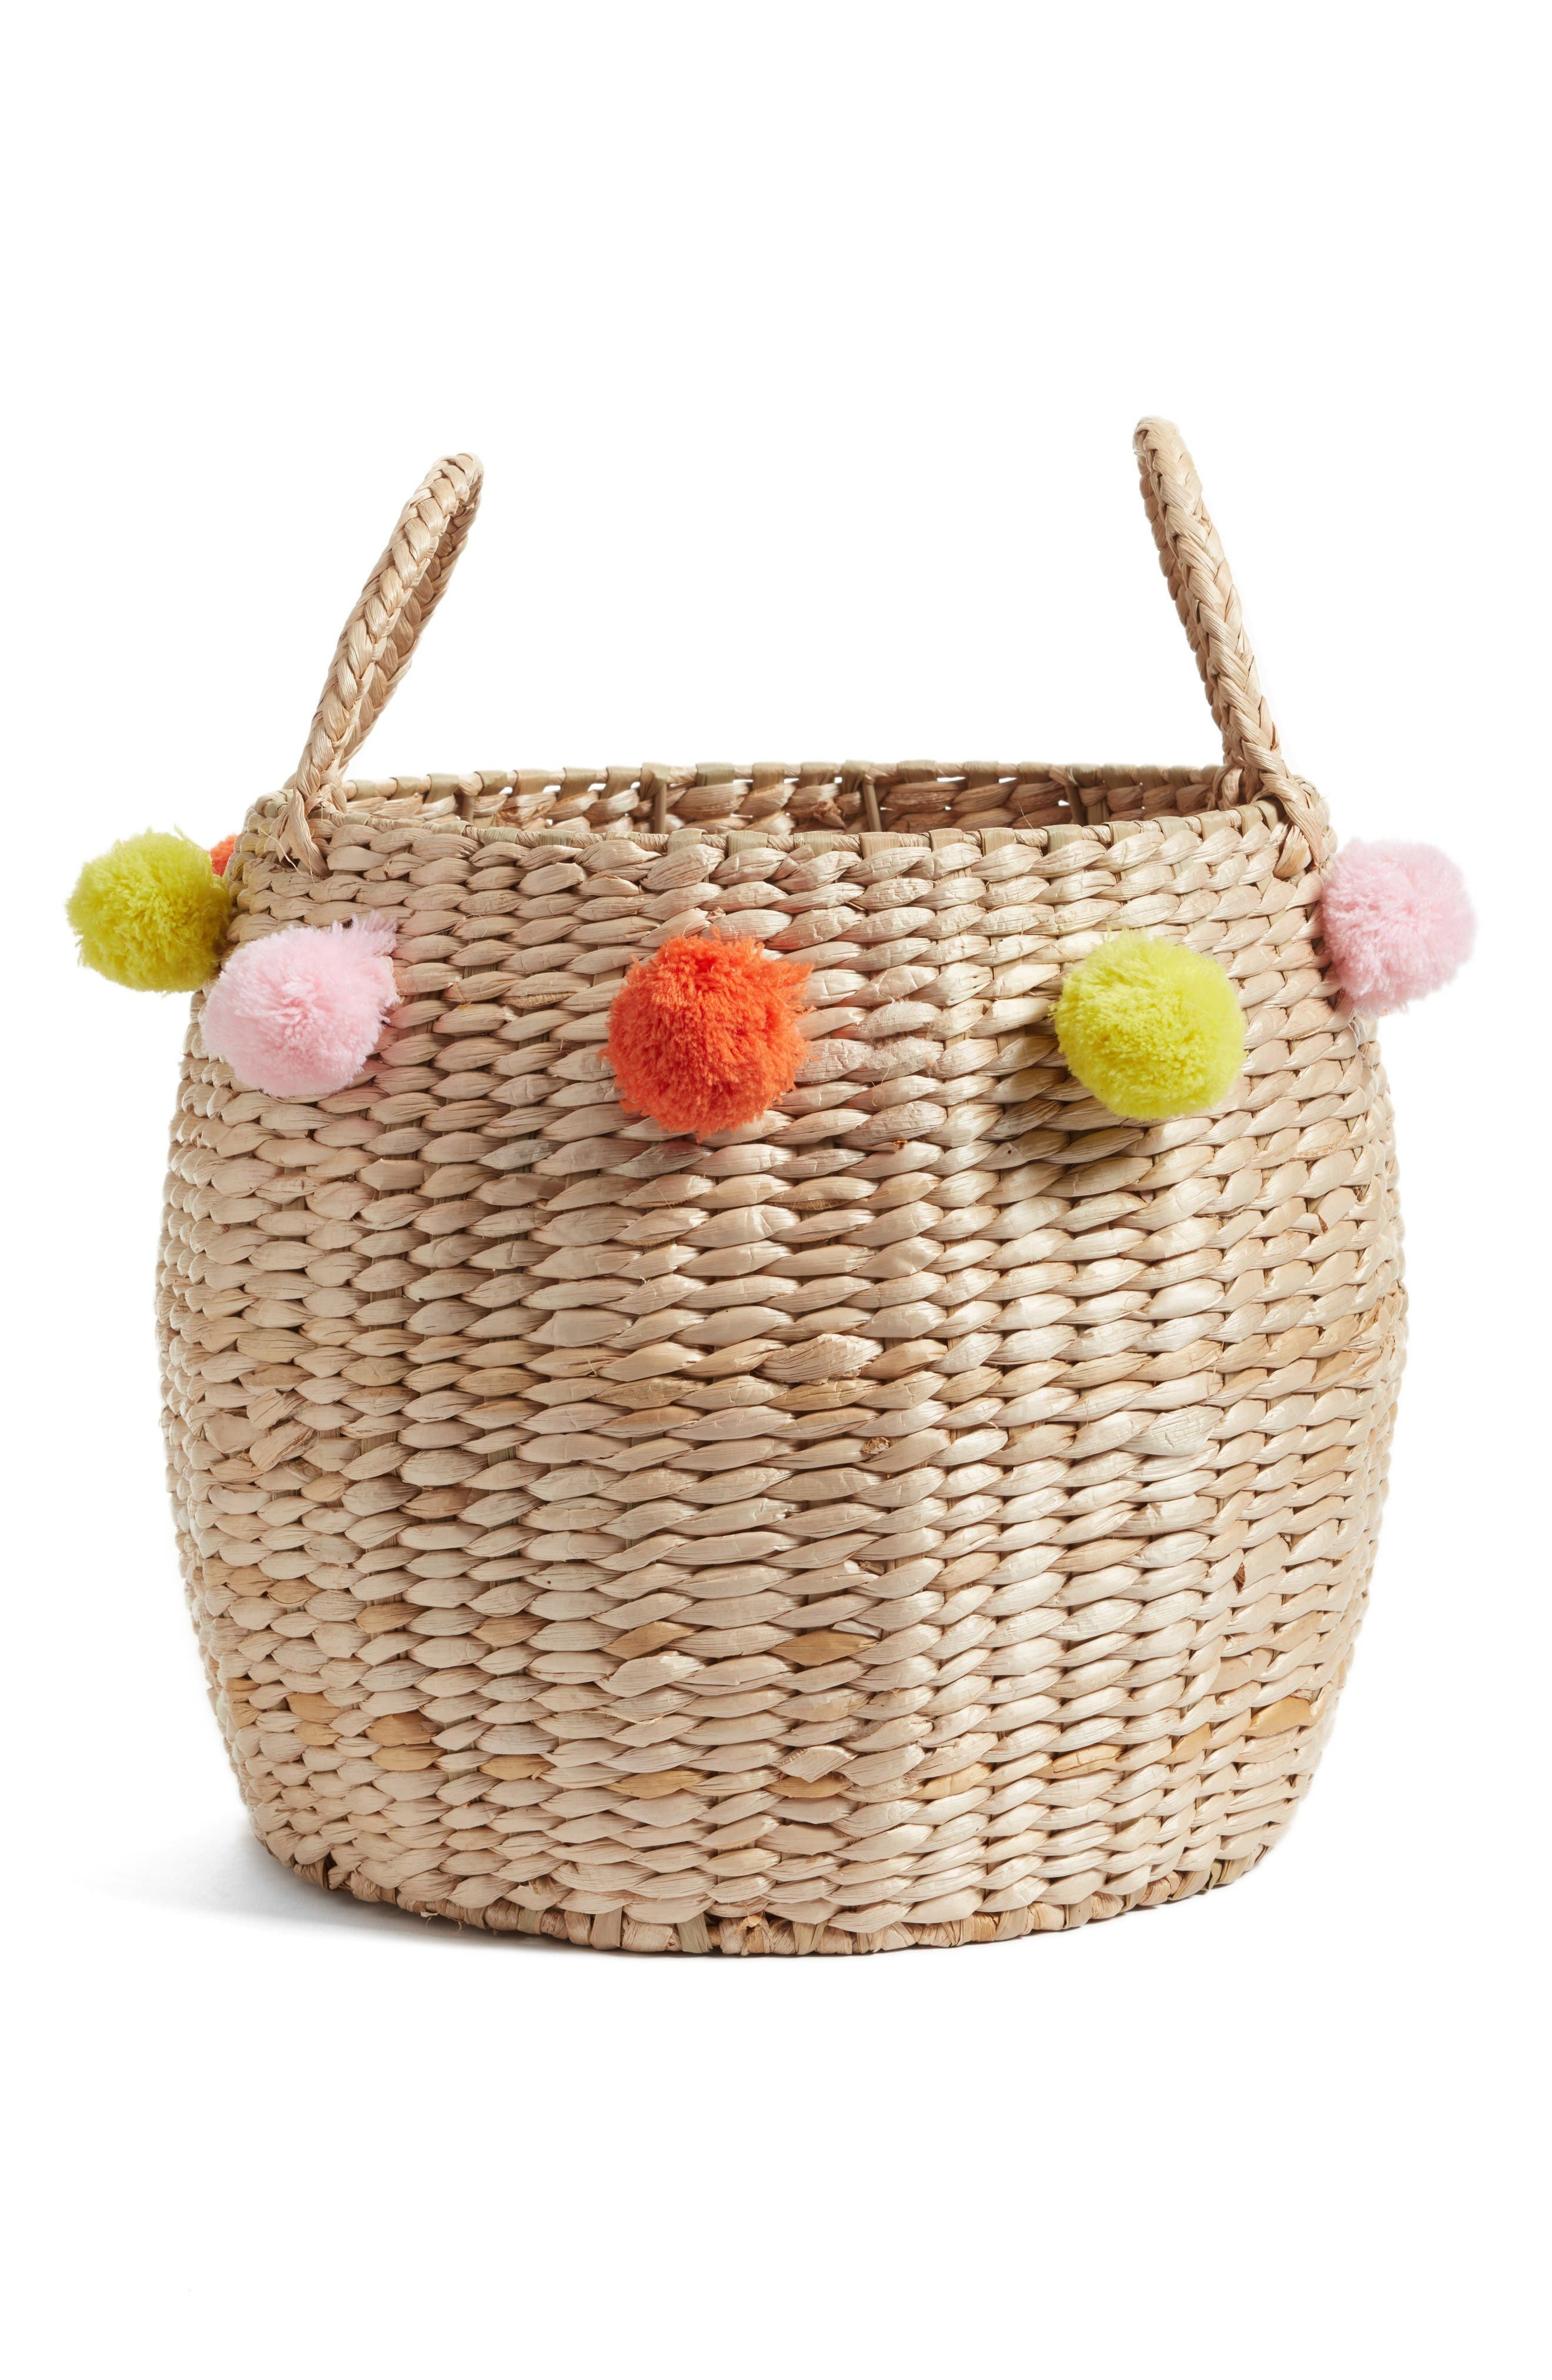 Main Image - Levtex Pompom Wicker Basket